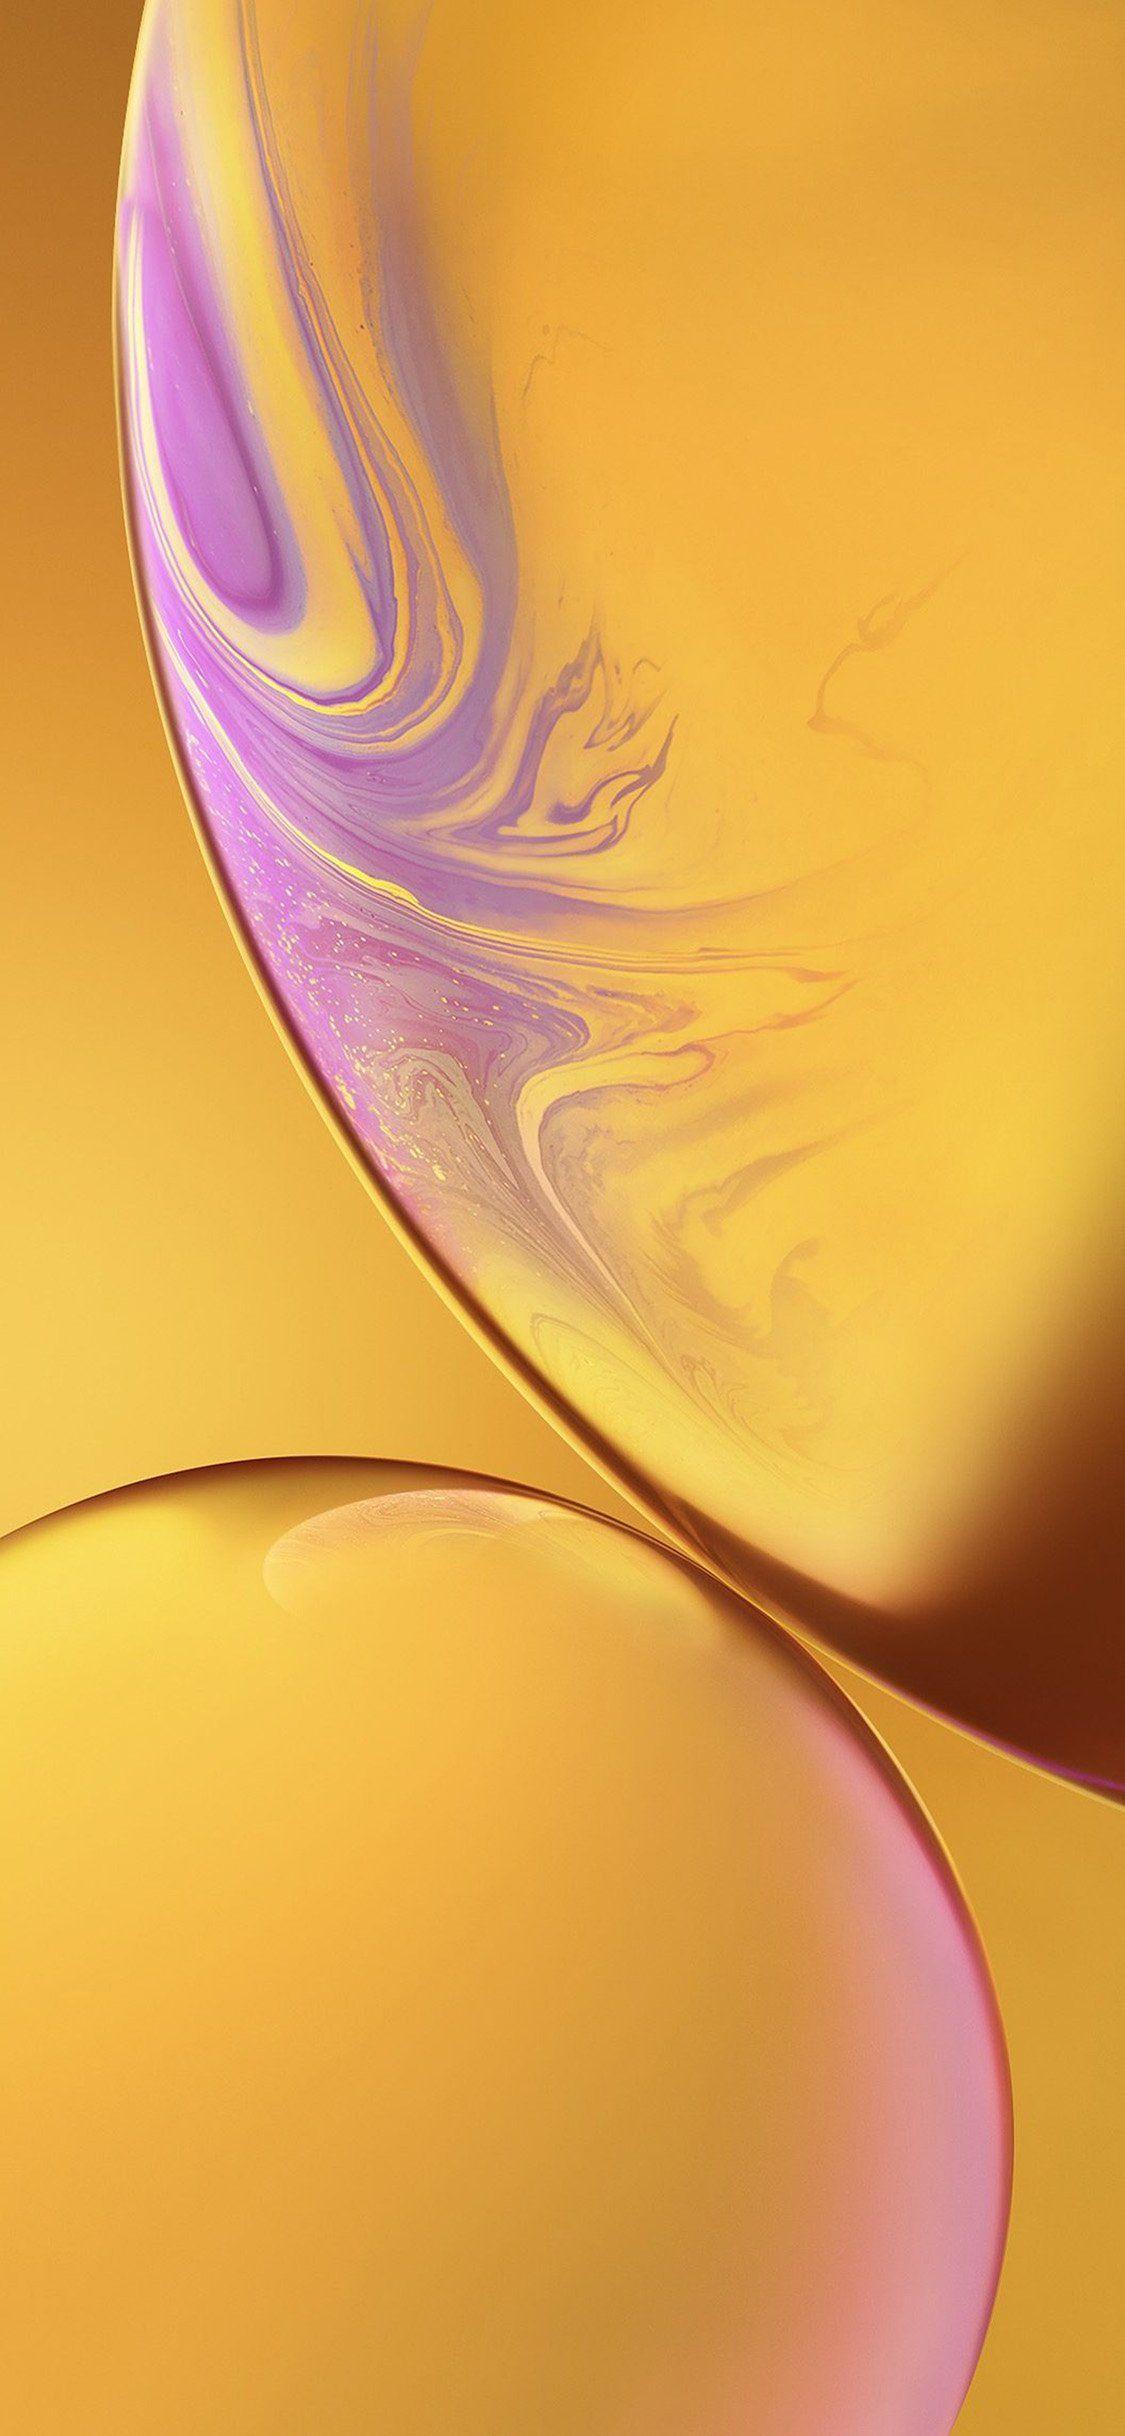 Yellow Bubble Iphone X Wallpaper Iphone Wallpaper Yellow Apple Logo Wallpaper Iphone Iphone Wallpaper Ios